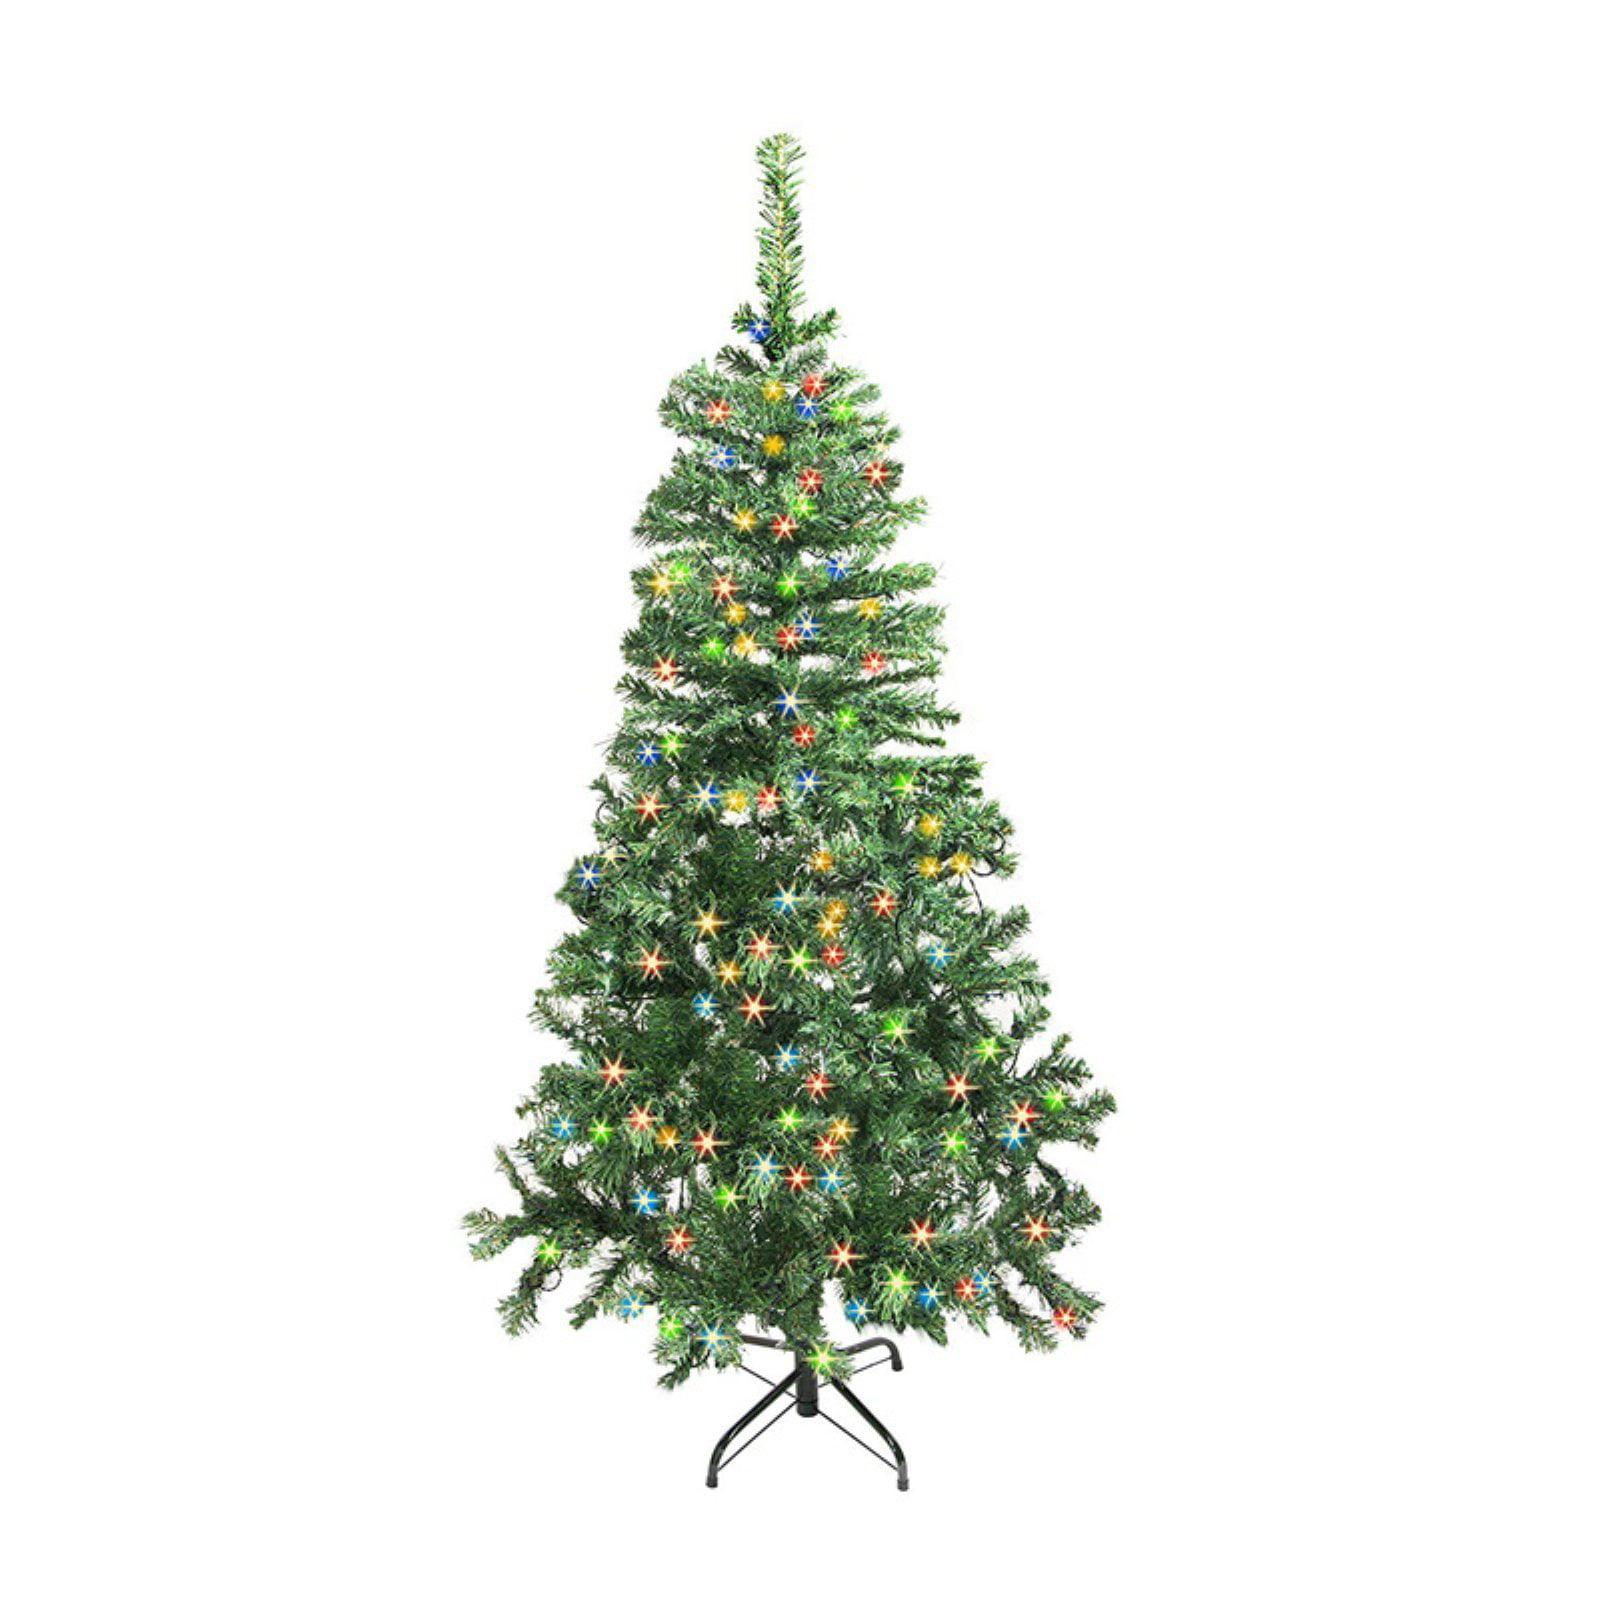 7 5 Foot Artificial Christmas Tree Multi Colored Lights: ALEKO CTLG84H250MC Luscious Artificial Christmas Tree